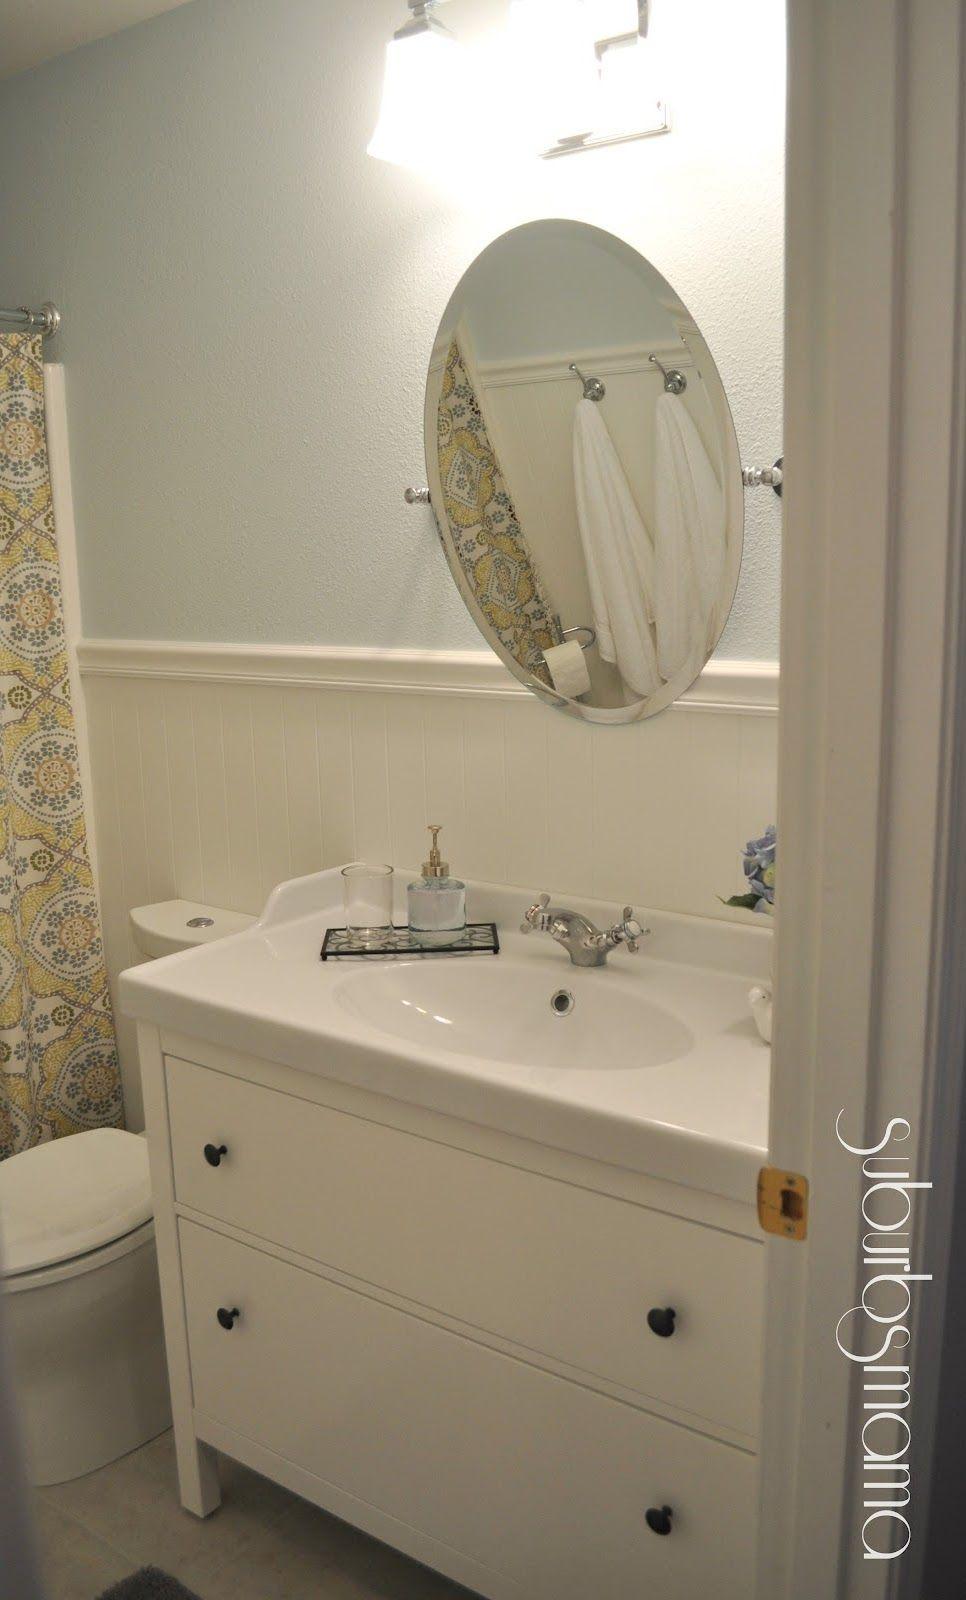 Suburbs mama hallway bath reveal ikea vanity sink - Ikea bathroom sinks and vanities ...